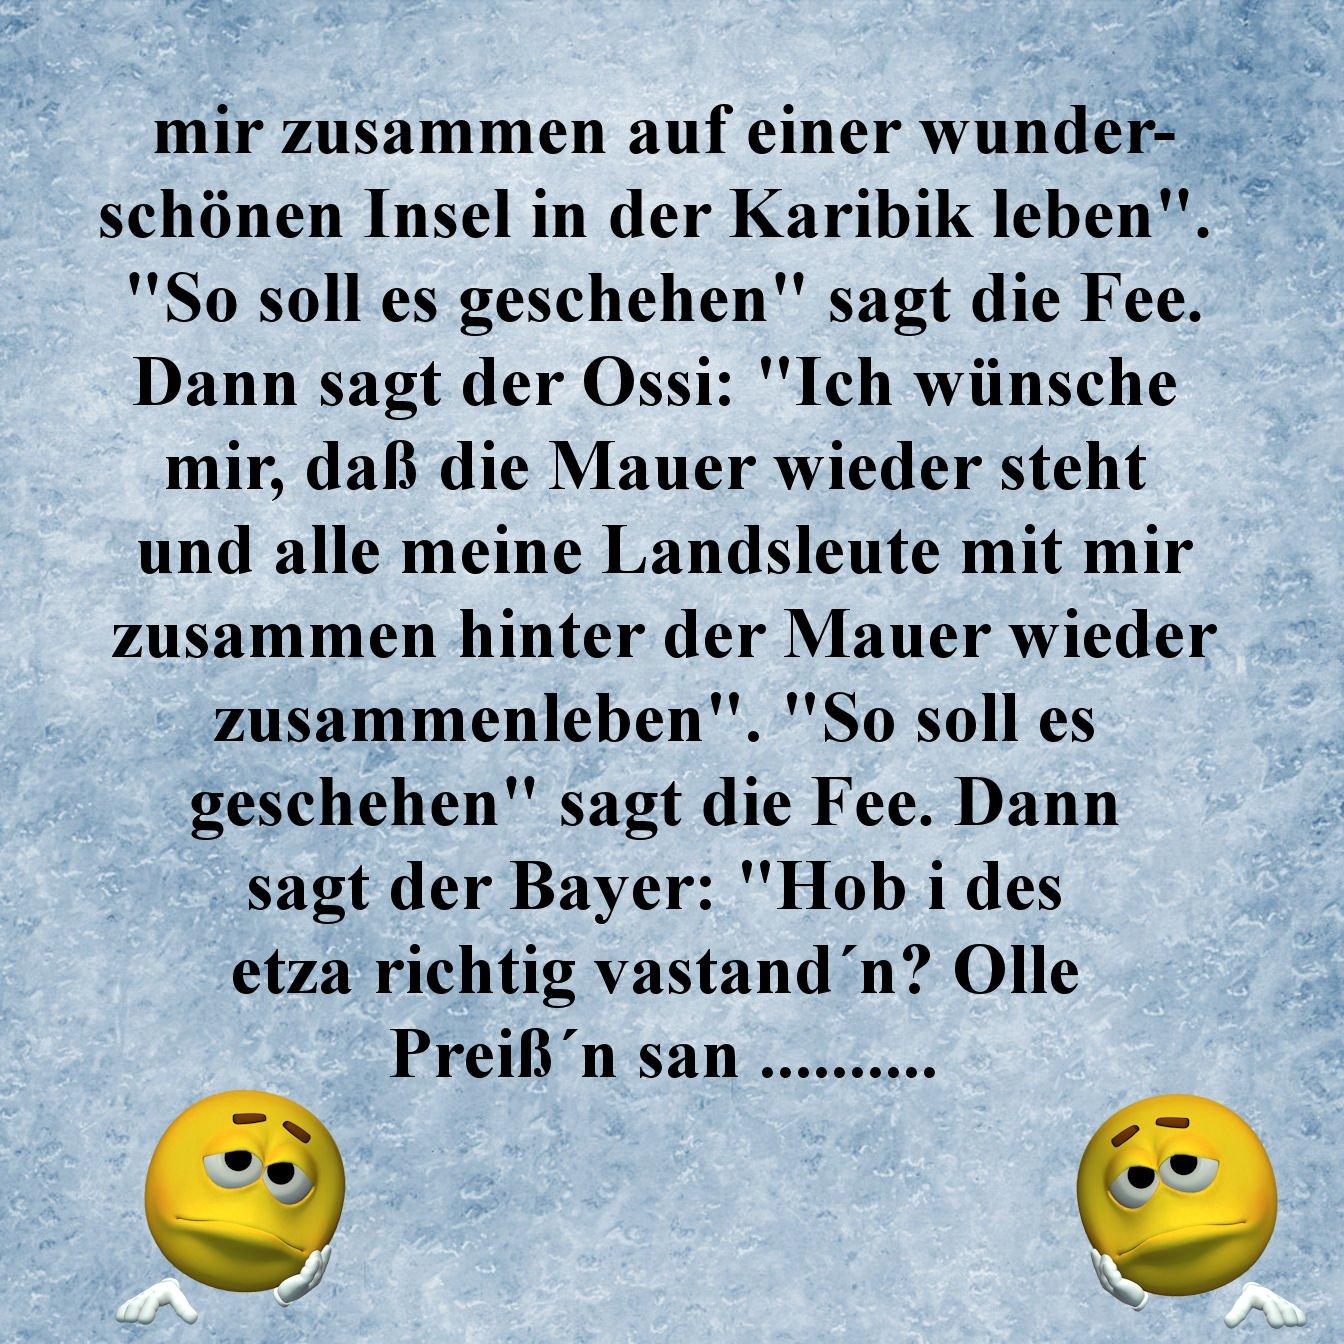 Bayern Witze